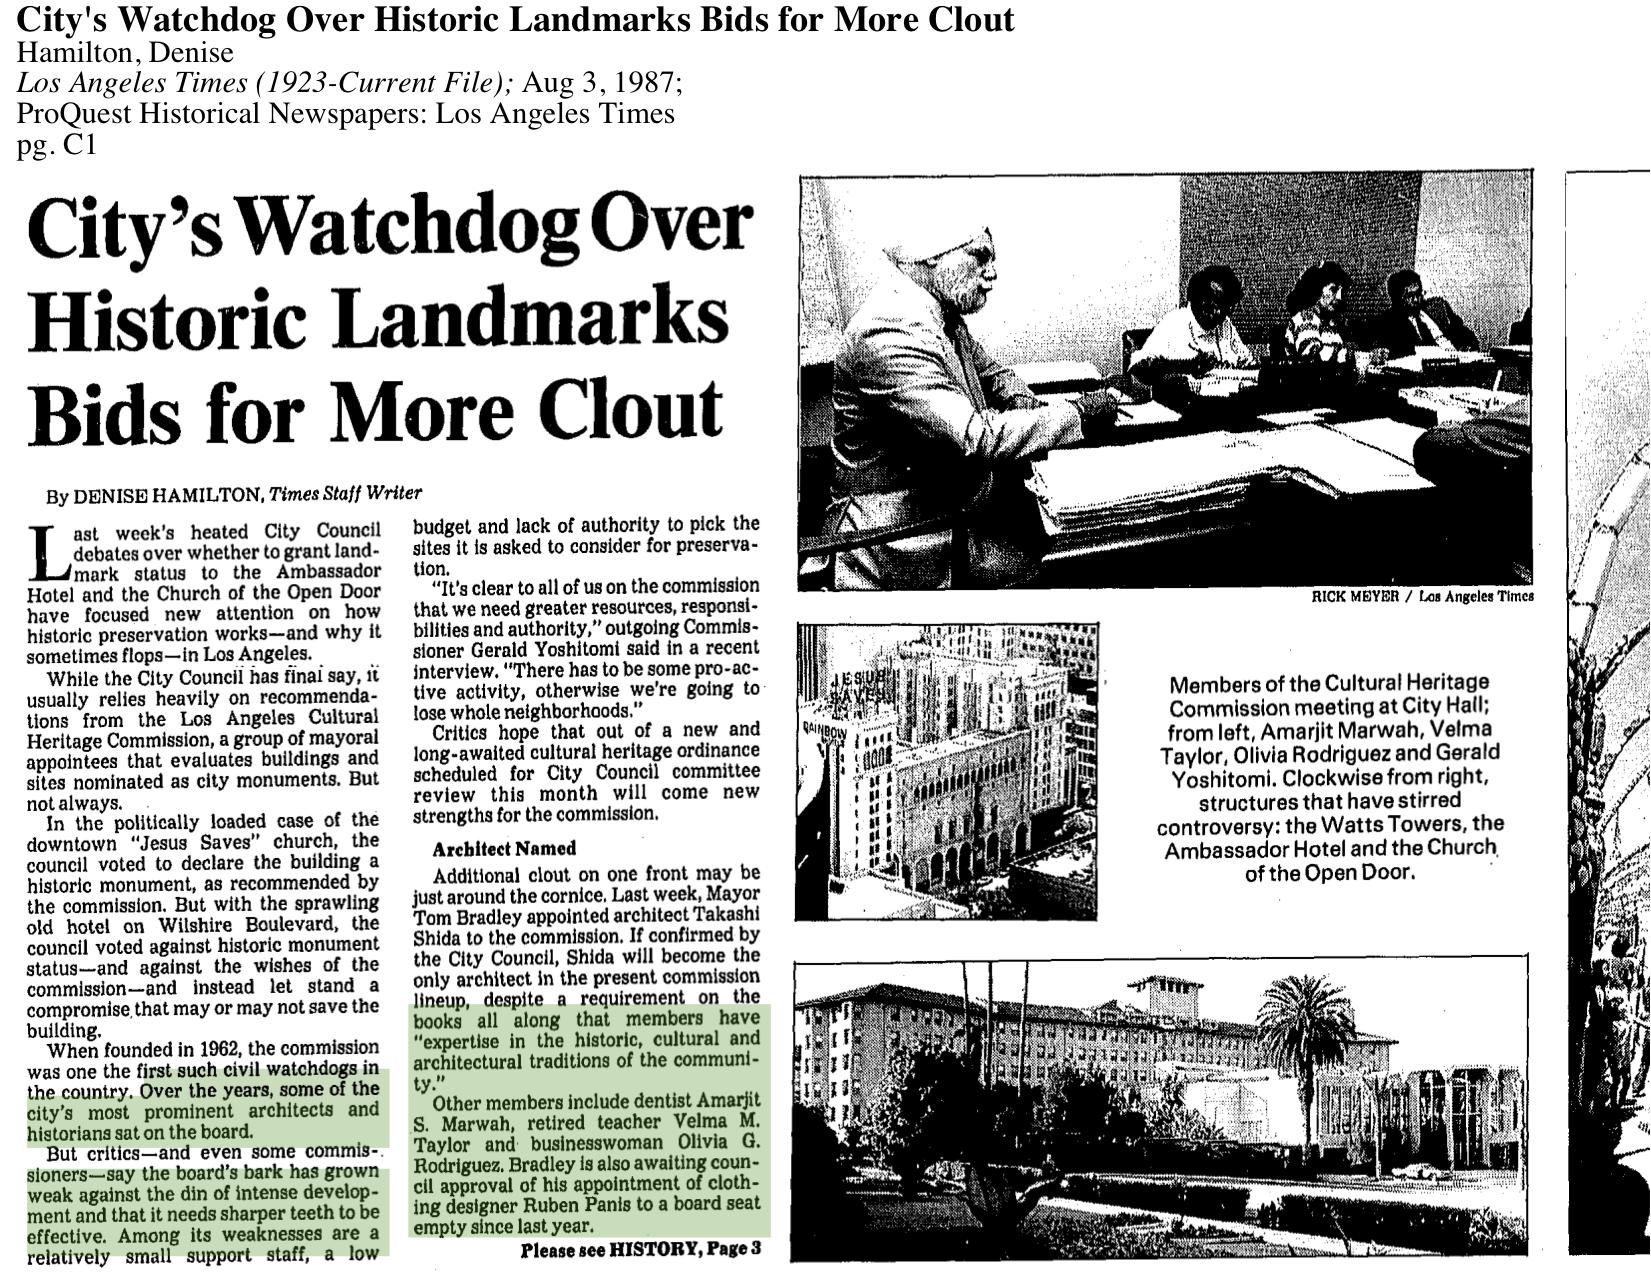 1987-City's Watchdog Over Historic Landmarks